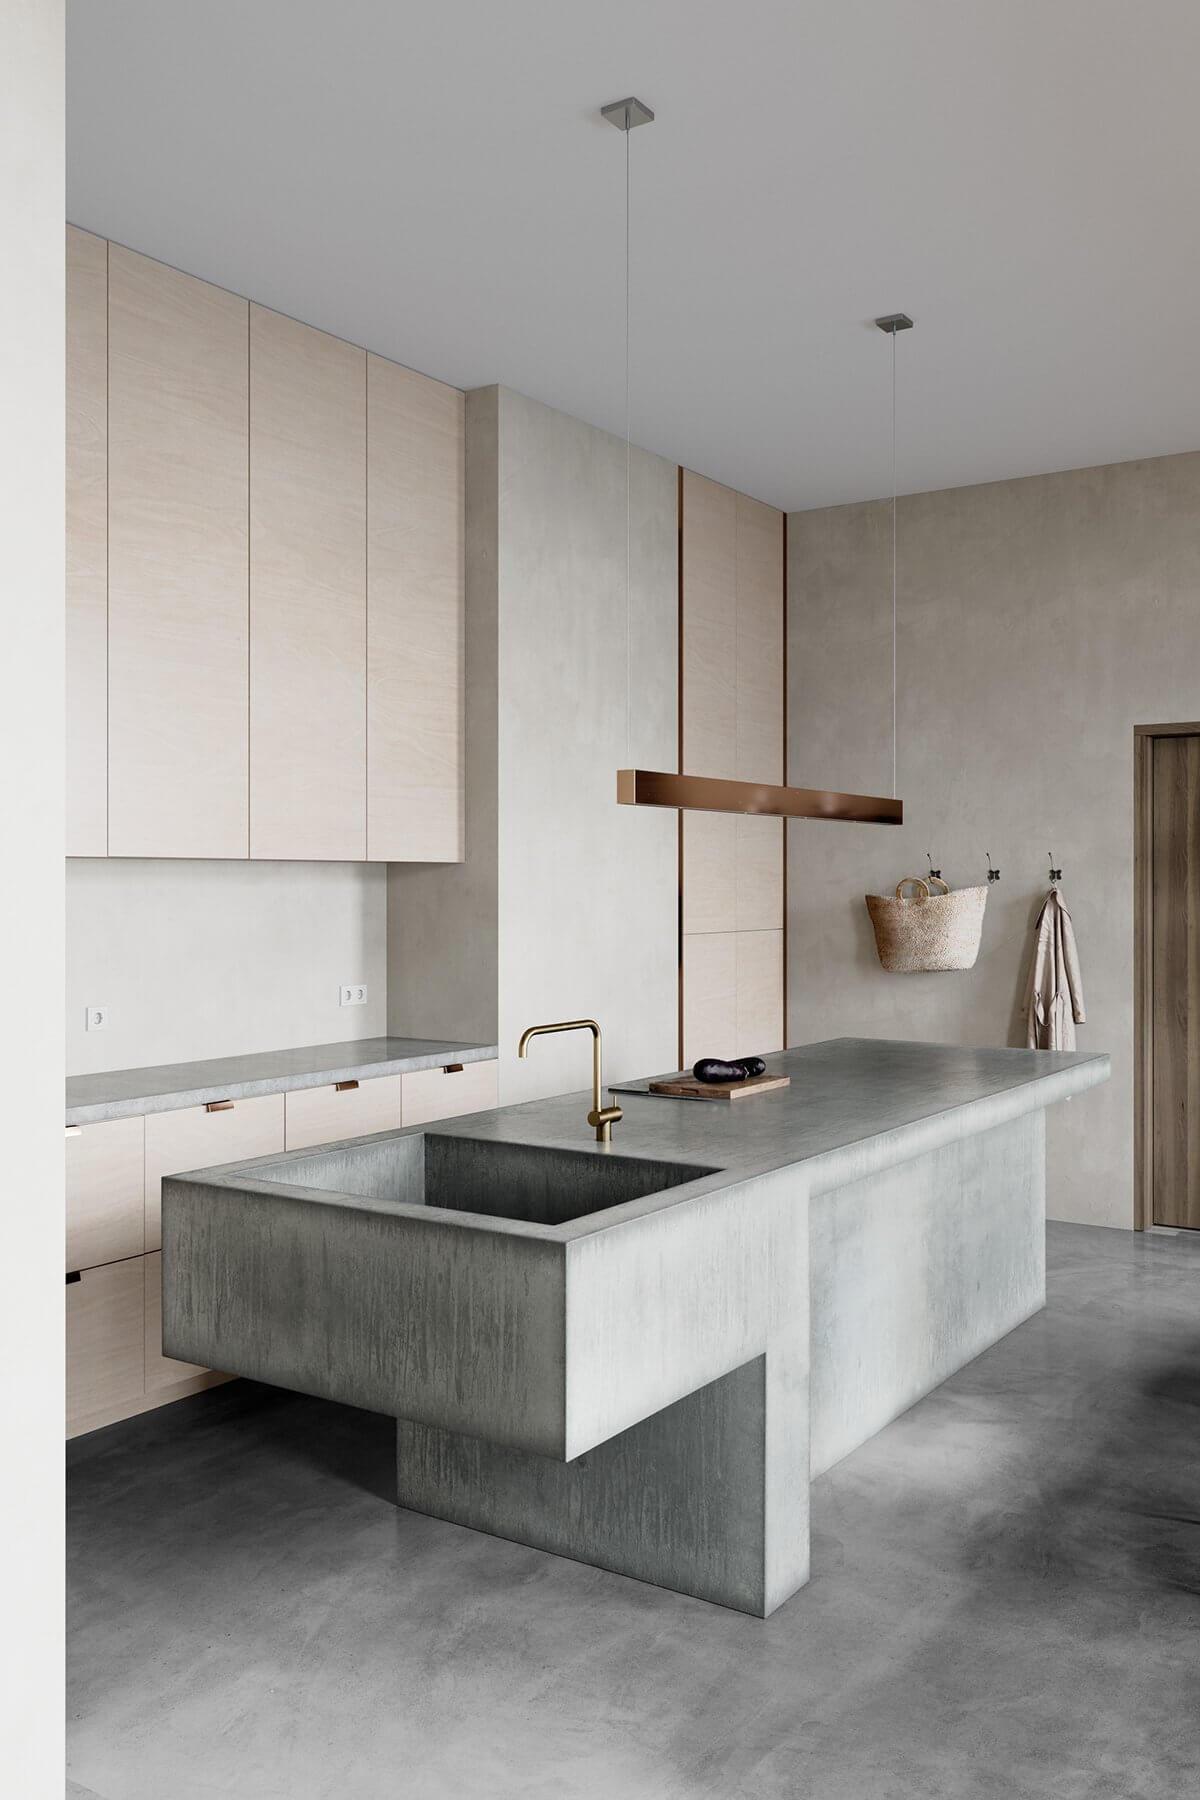 Studio Apartment in Berlin Kreuzberg-kitchen-block-concrete